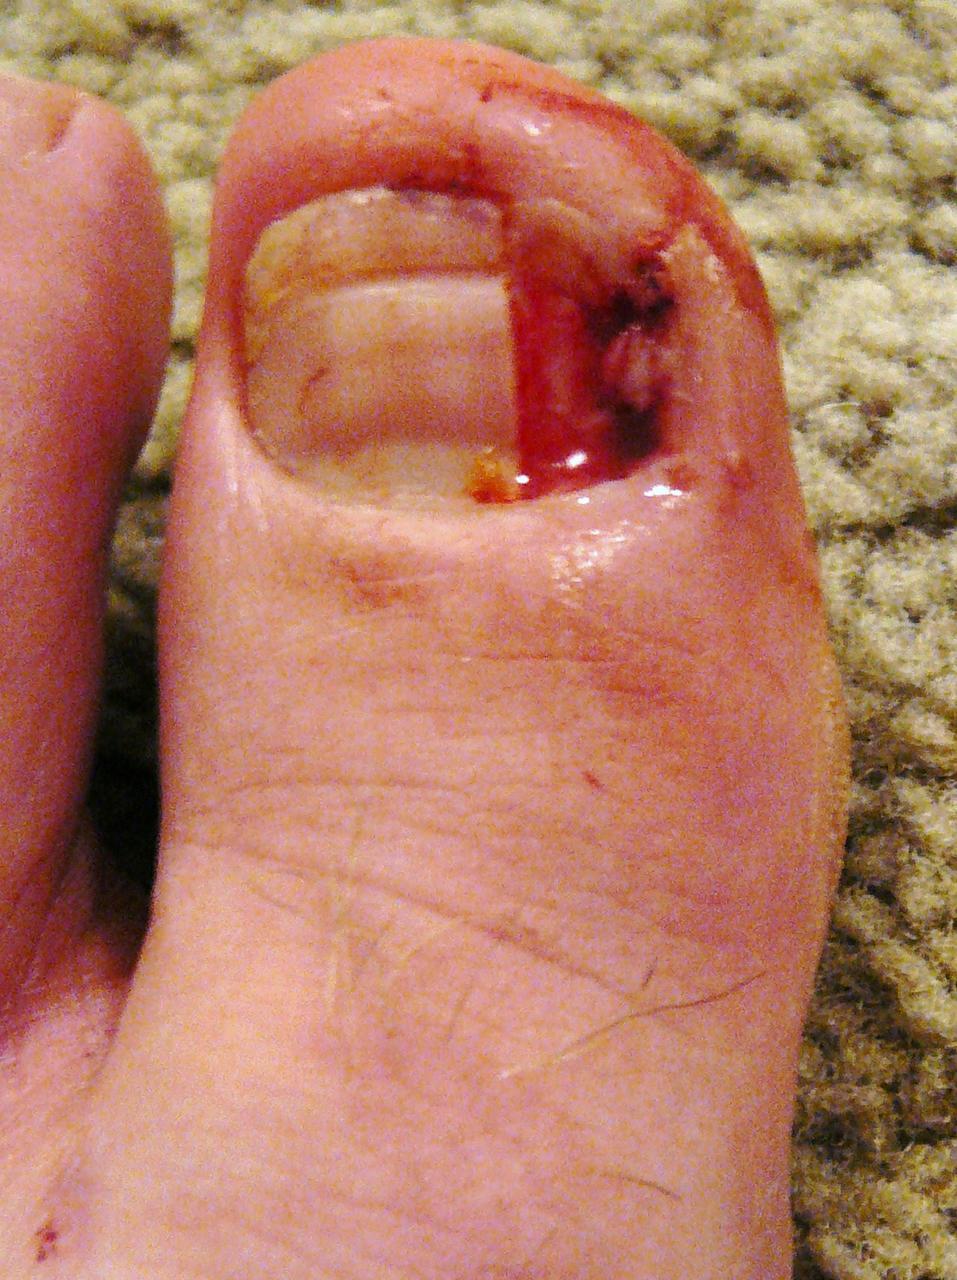 how to cut off ingrown toenail